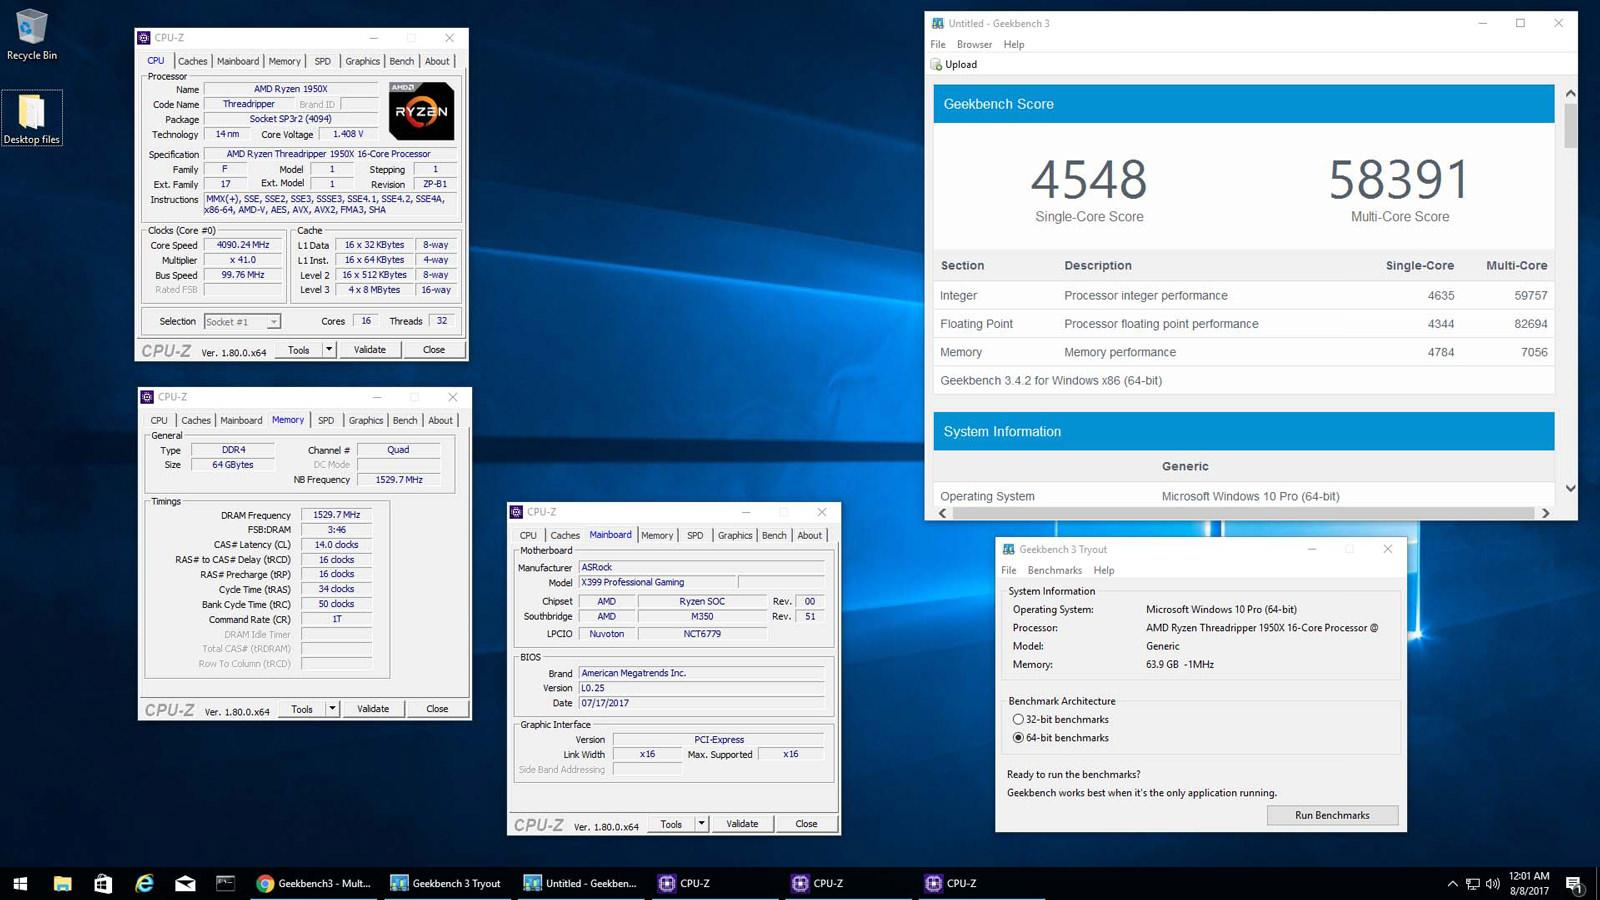 AMD Ryzen Threadripper 1950X overclocked 2